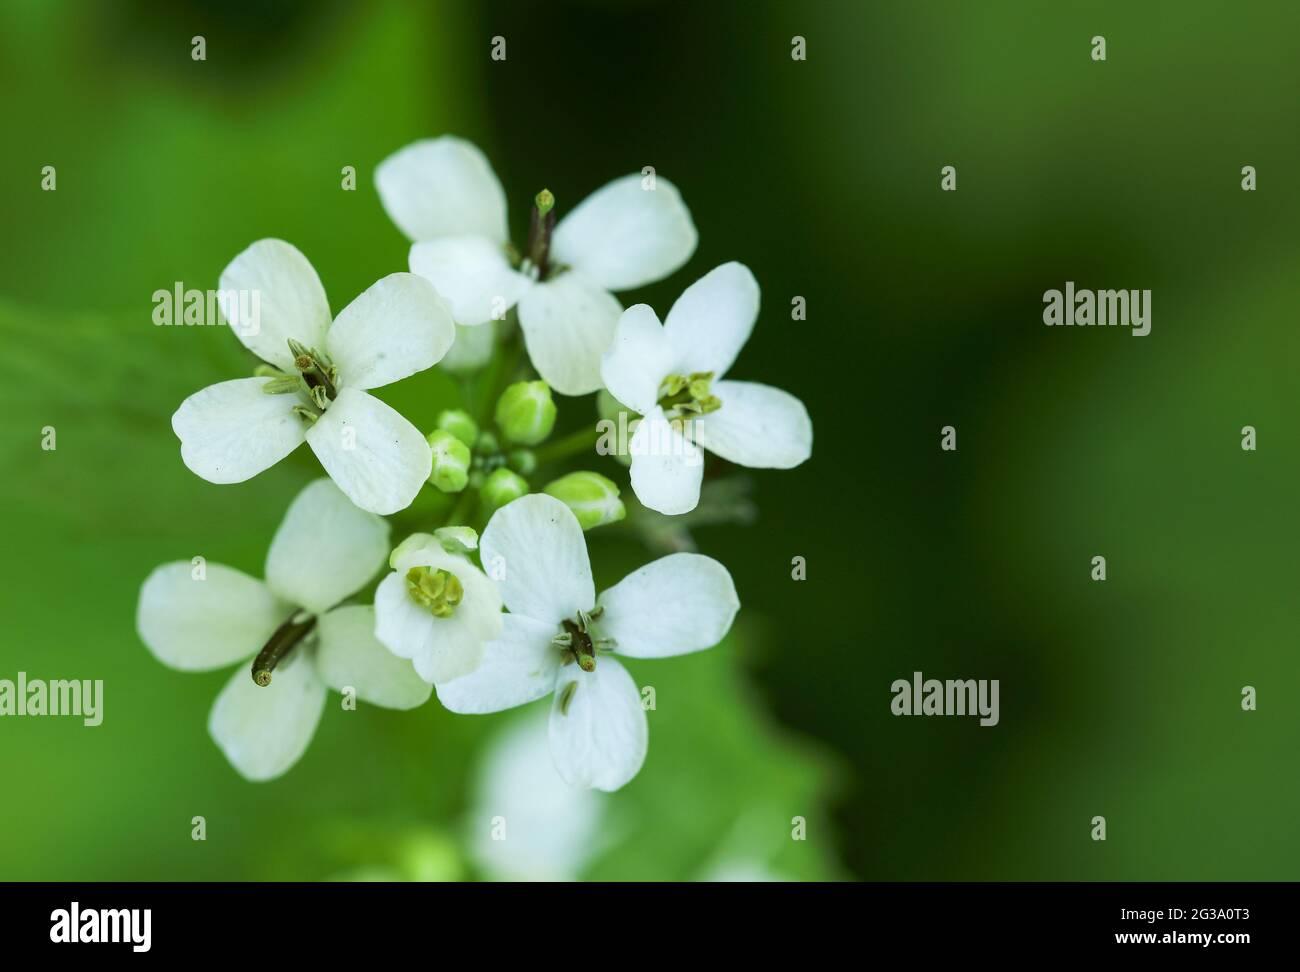 Alliaria petiolata ajo (mostaza) Foto de stock